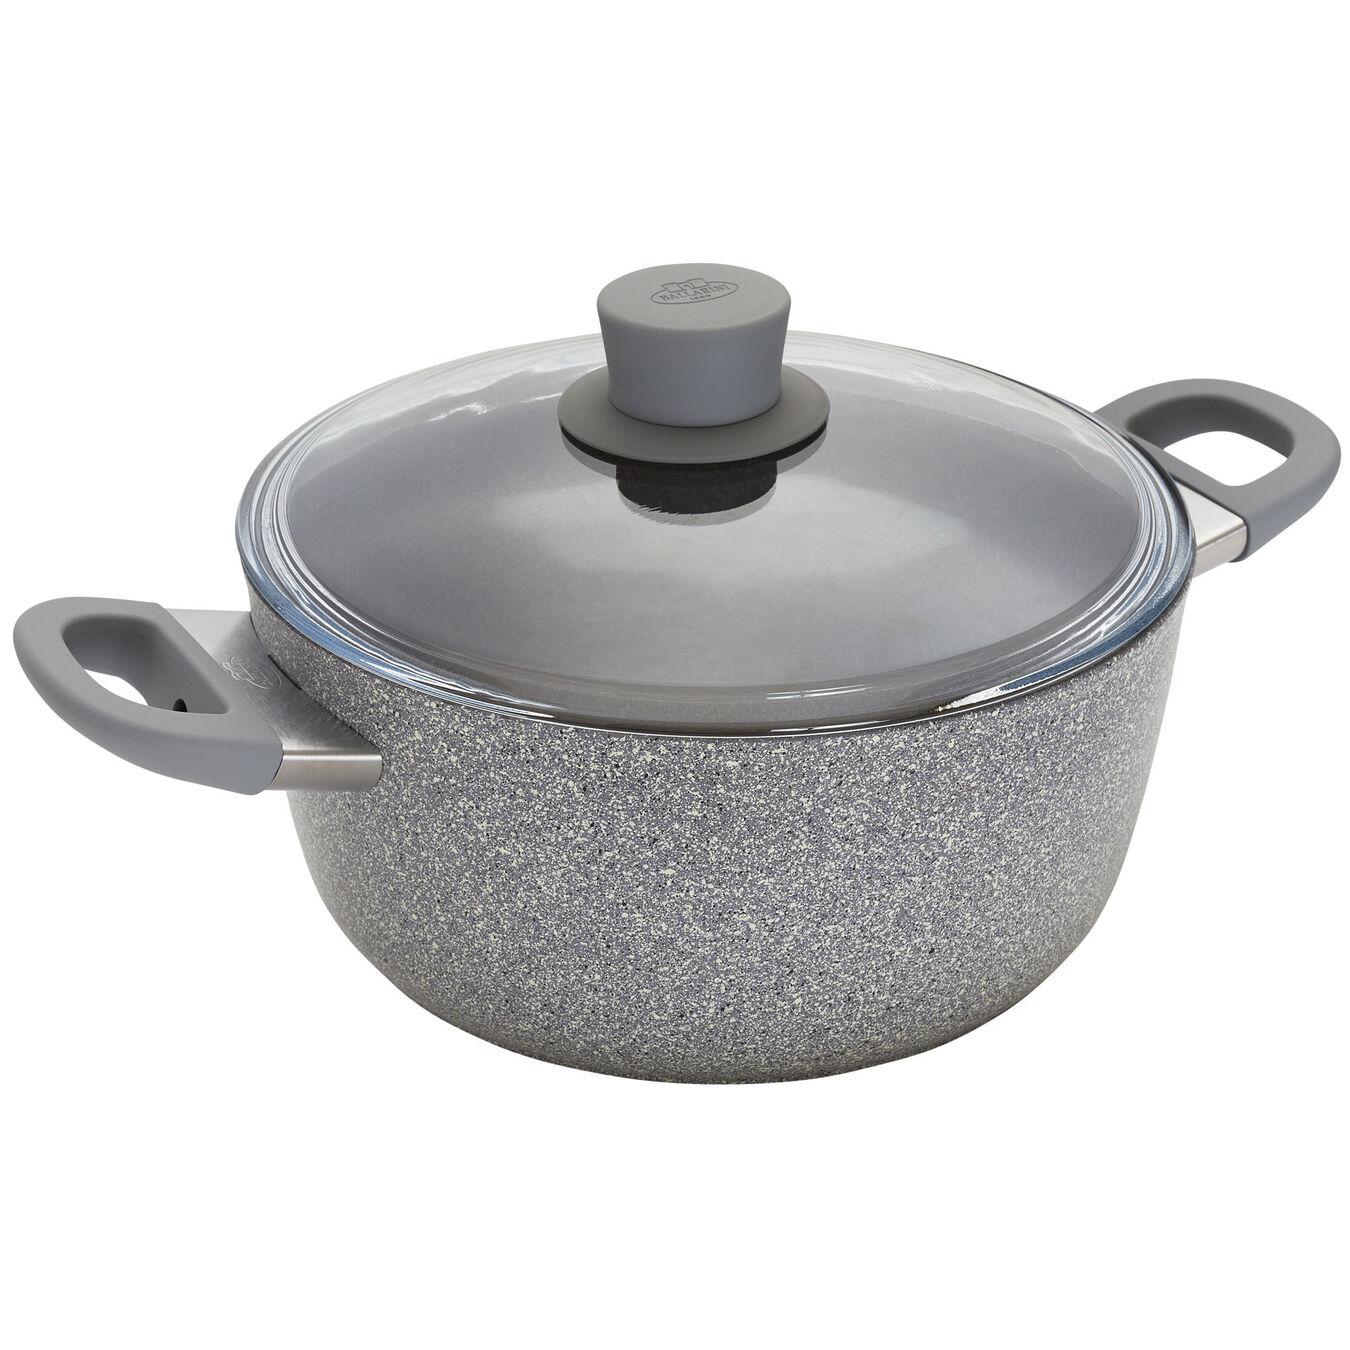 4.8 qt, aluminium, Nonstick Dutch Oven with Lid,,large 1